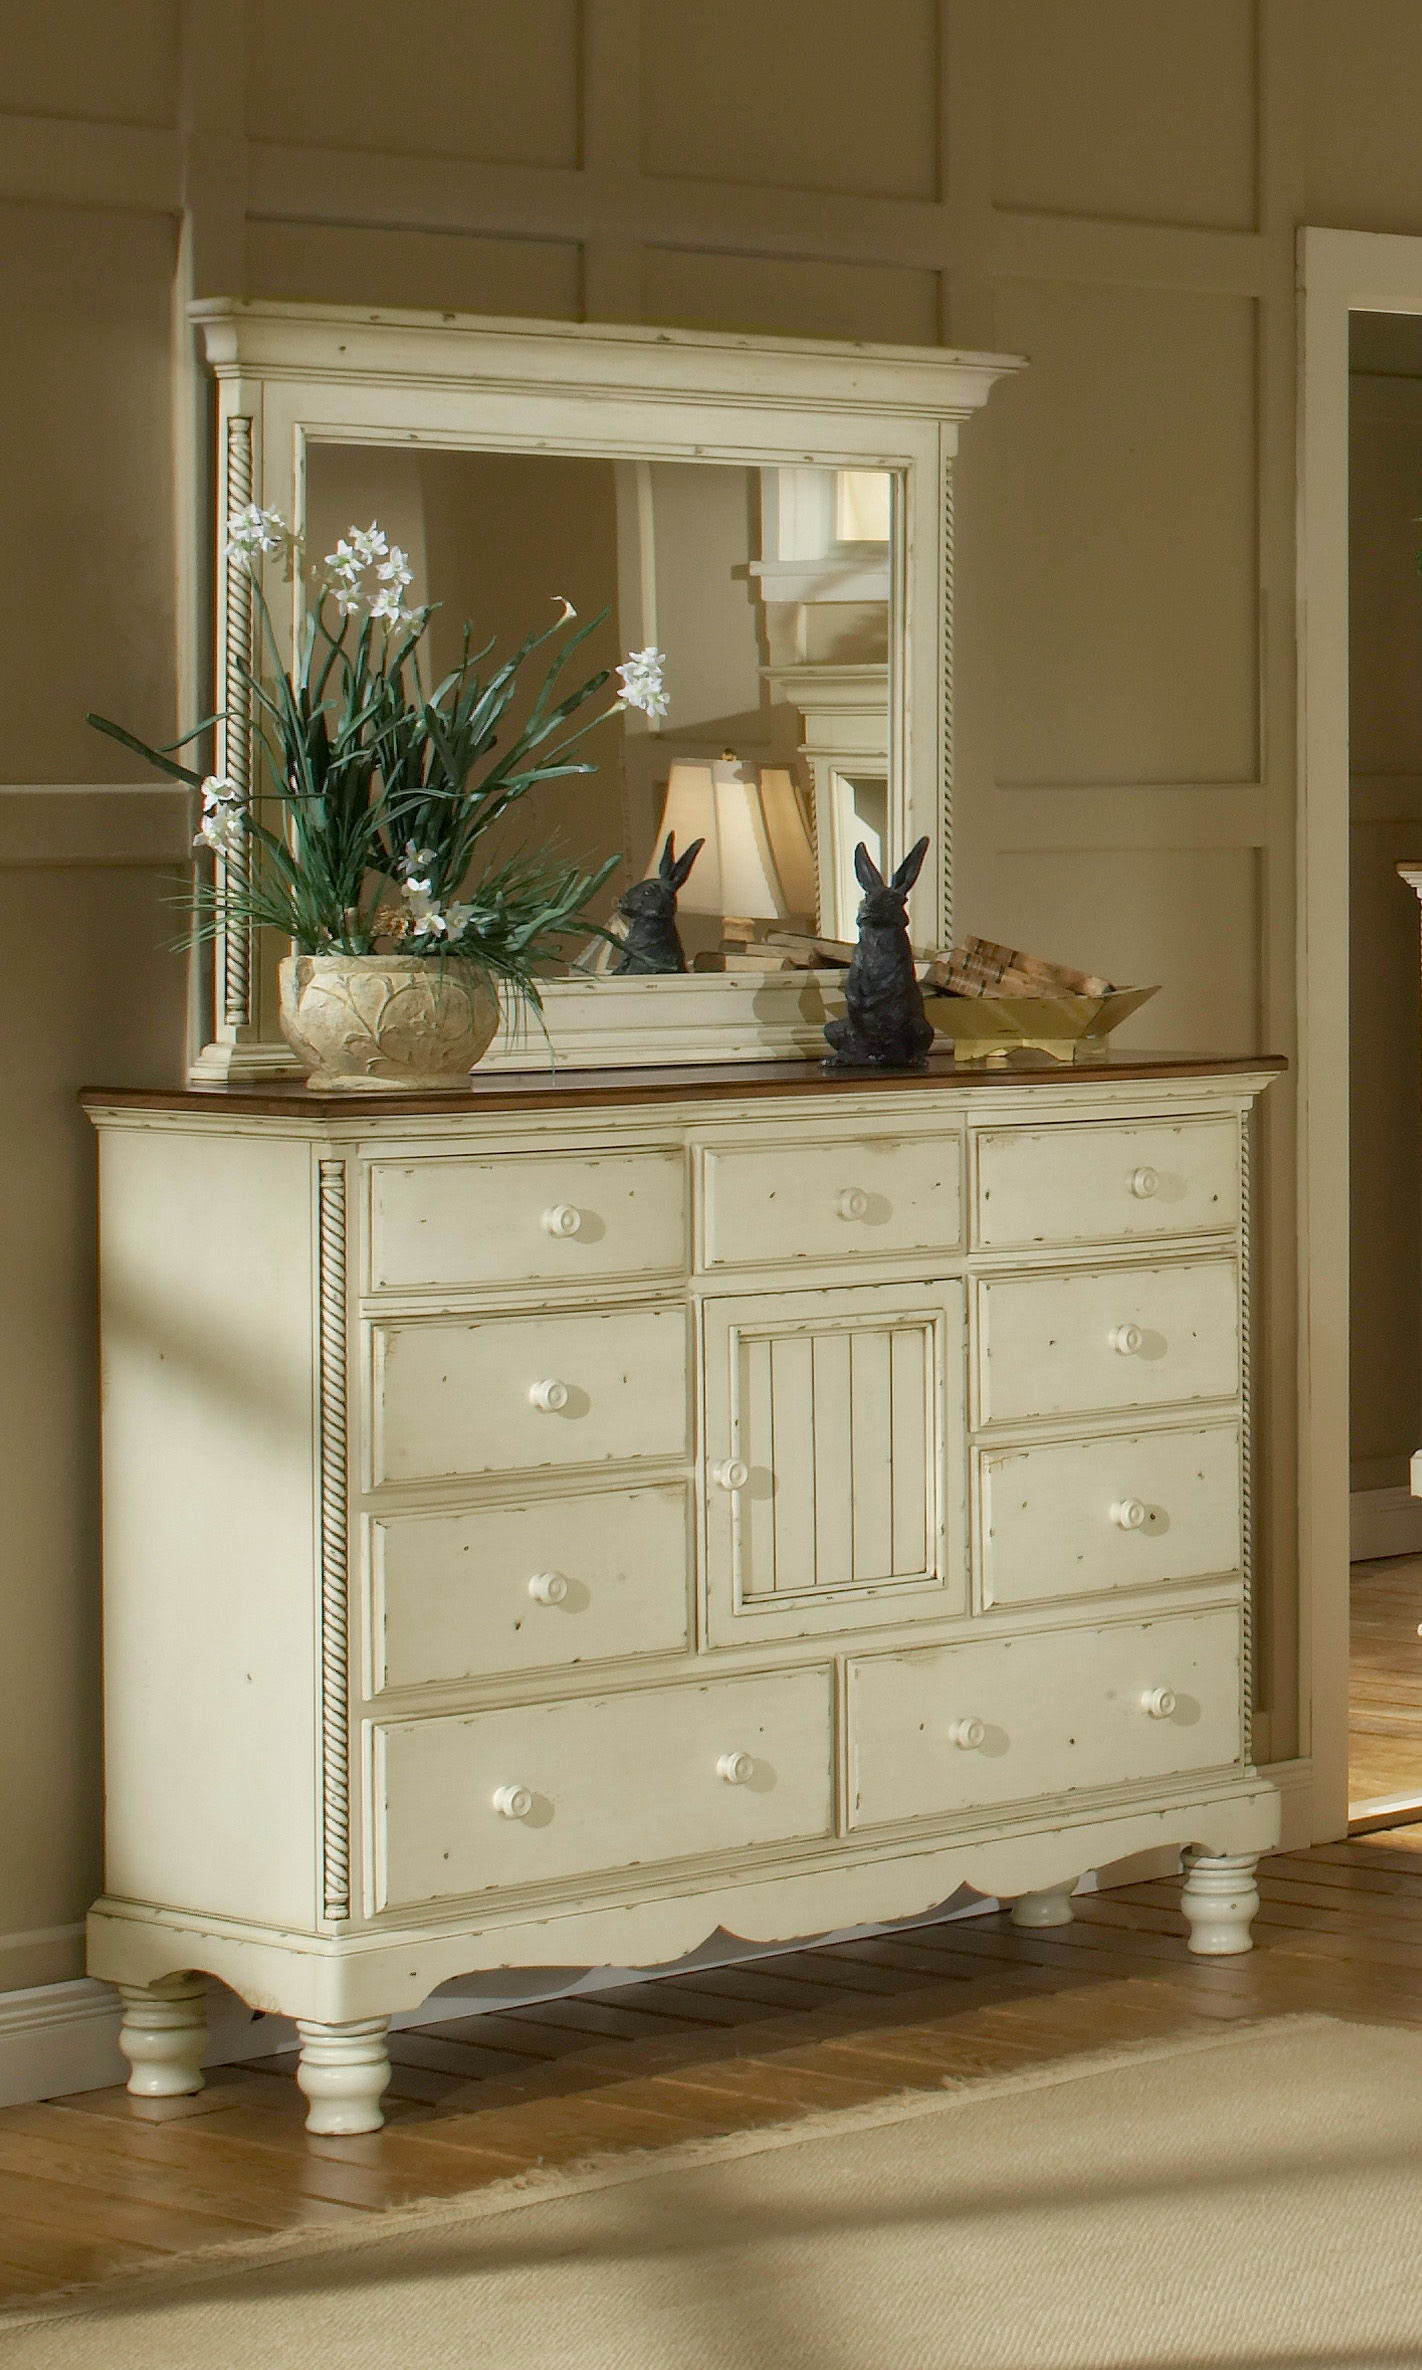 Hillsdale Furniture Bedroom Wilshire Mule Chest 1172 787   Furniture Plus  Inc.   Mesa, AZ